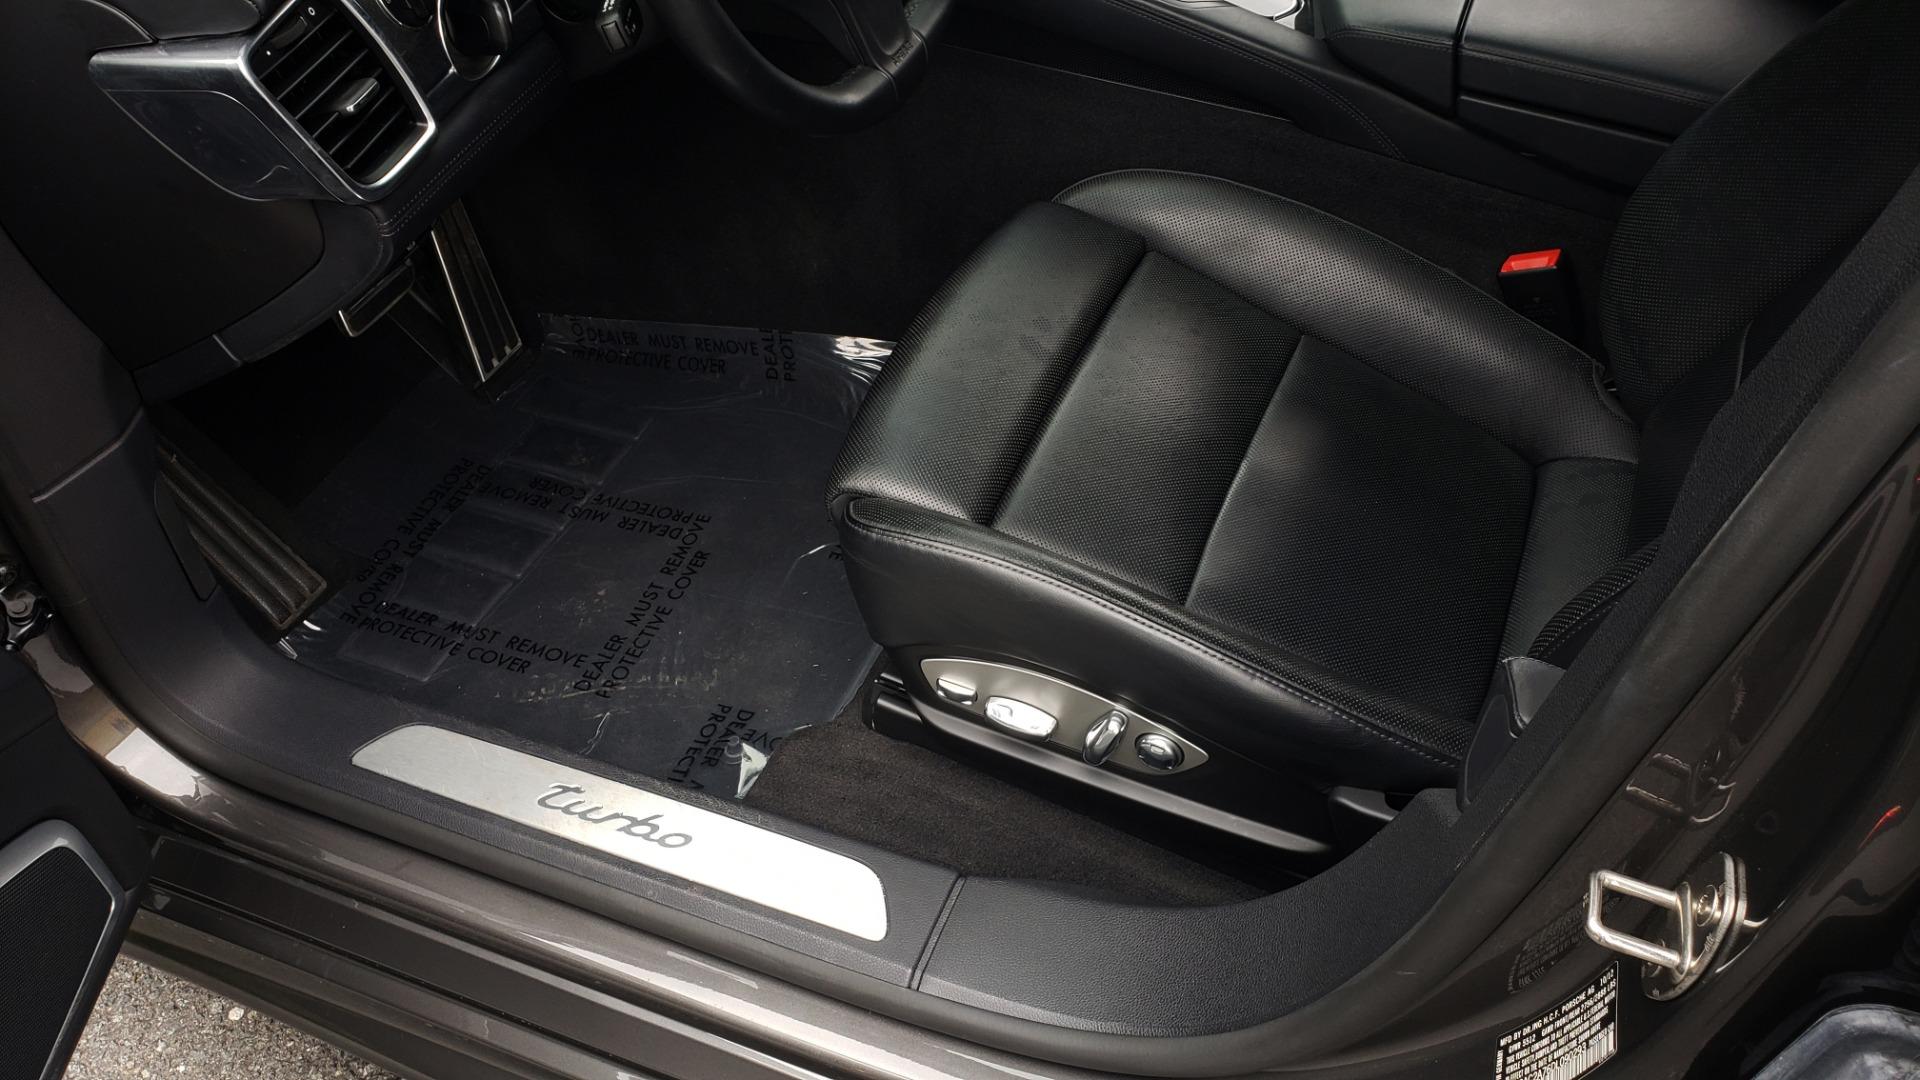 Used 2013 Porsche PANAMERA TURBO 4.8L V8 / AWD / NAV / SUNROOF / LCA / PARK ASST / BURMESTER for sale $45,995 at Formula Imports in Charlotte NC 28227 33